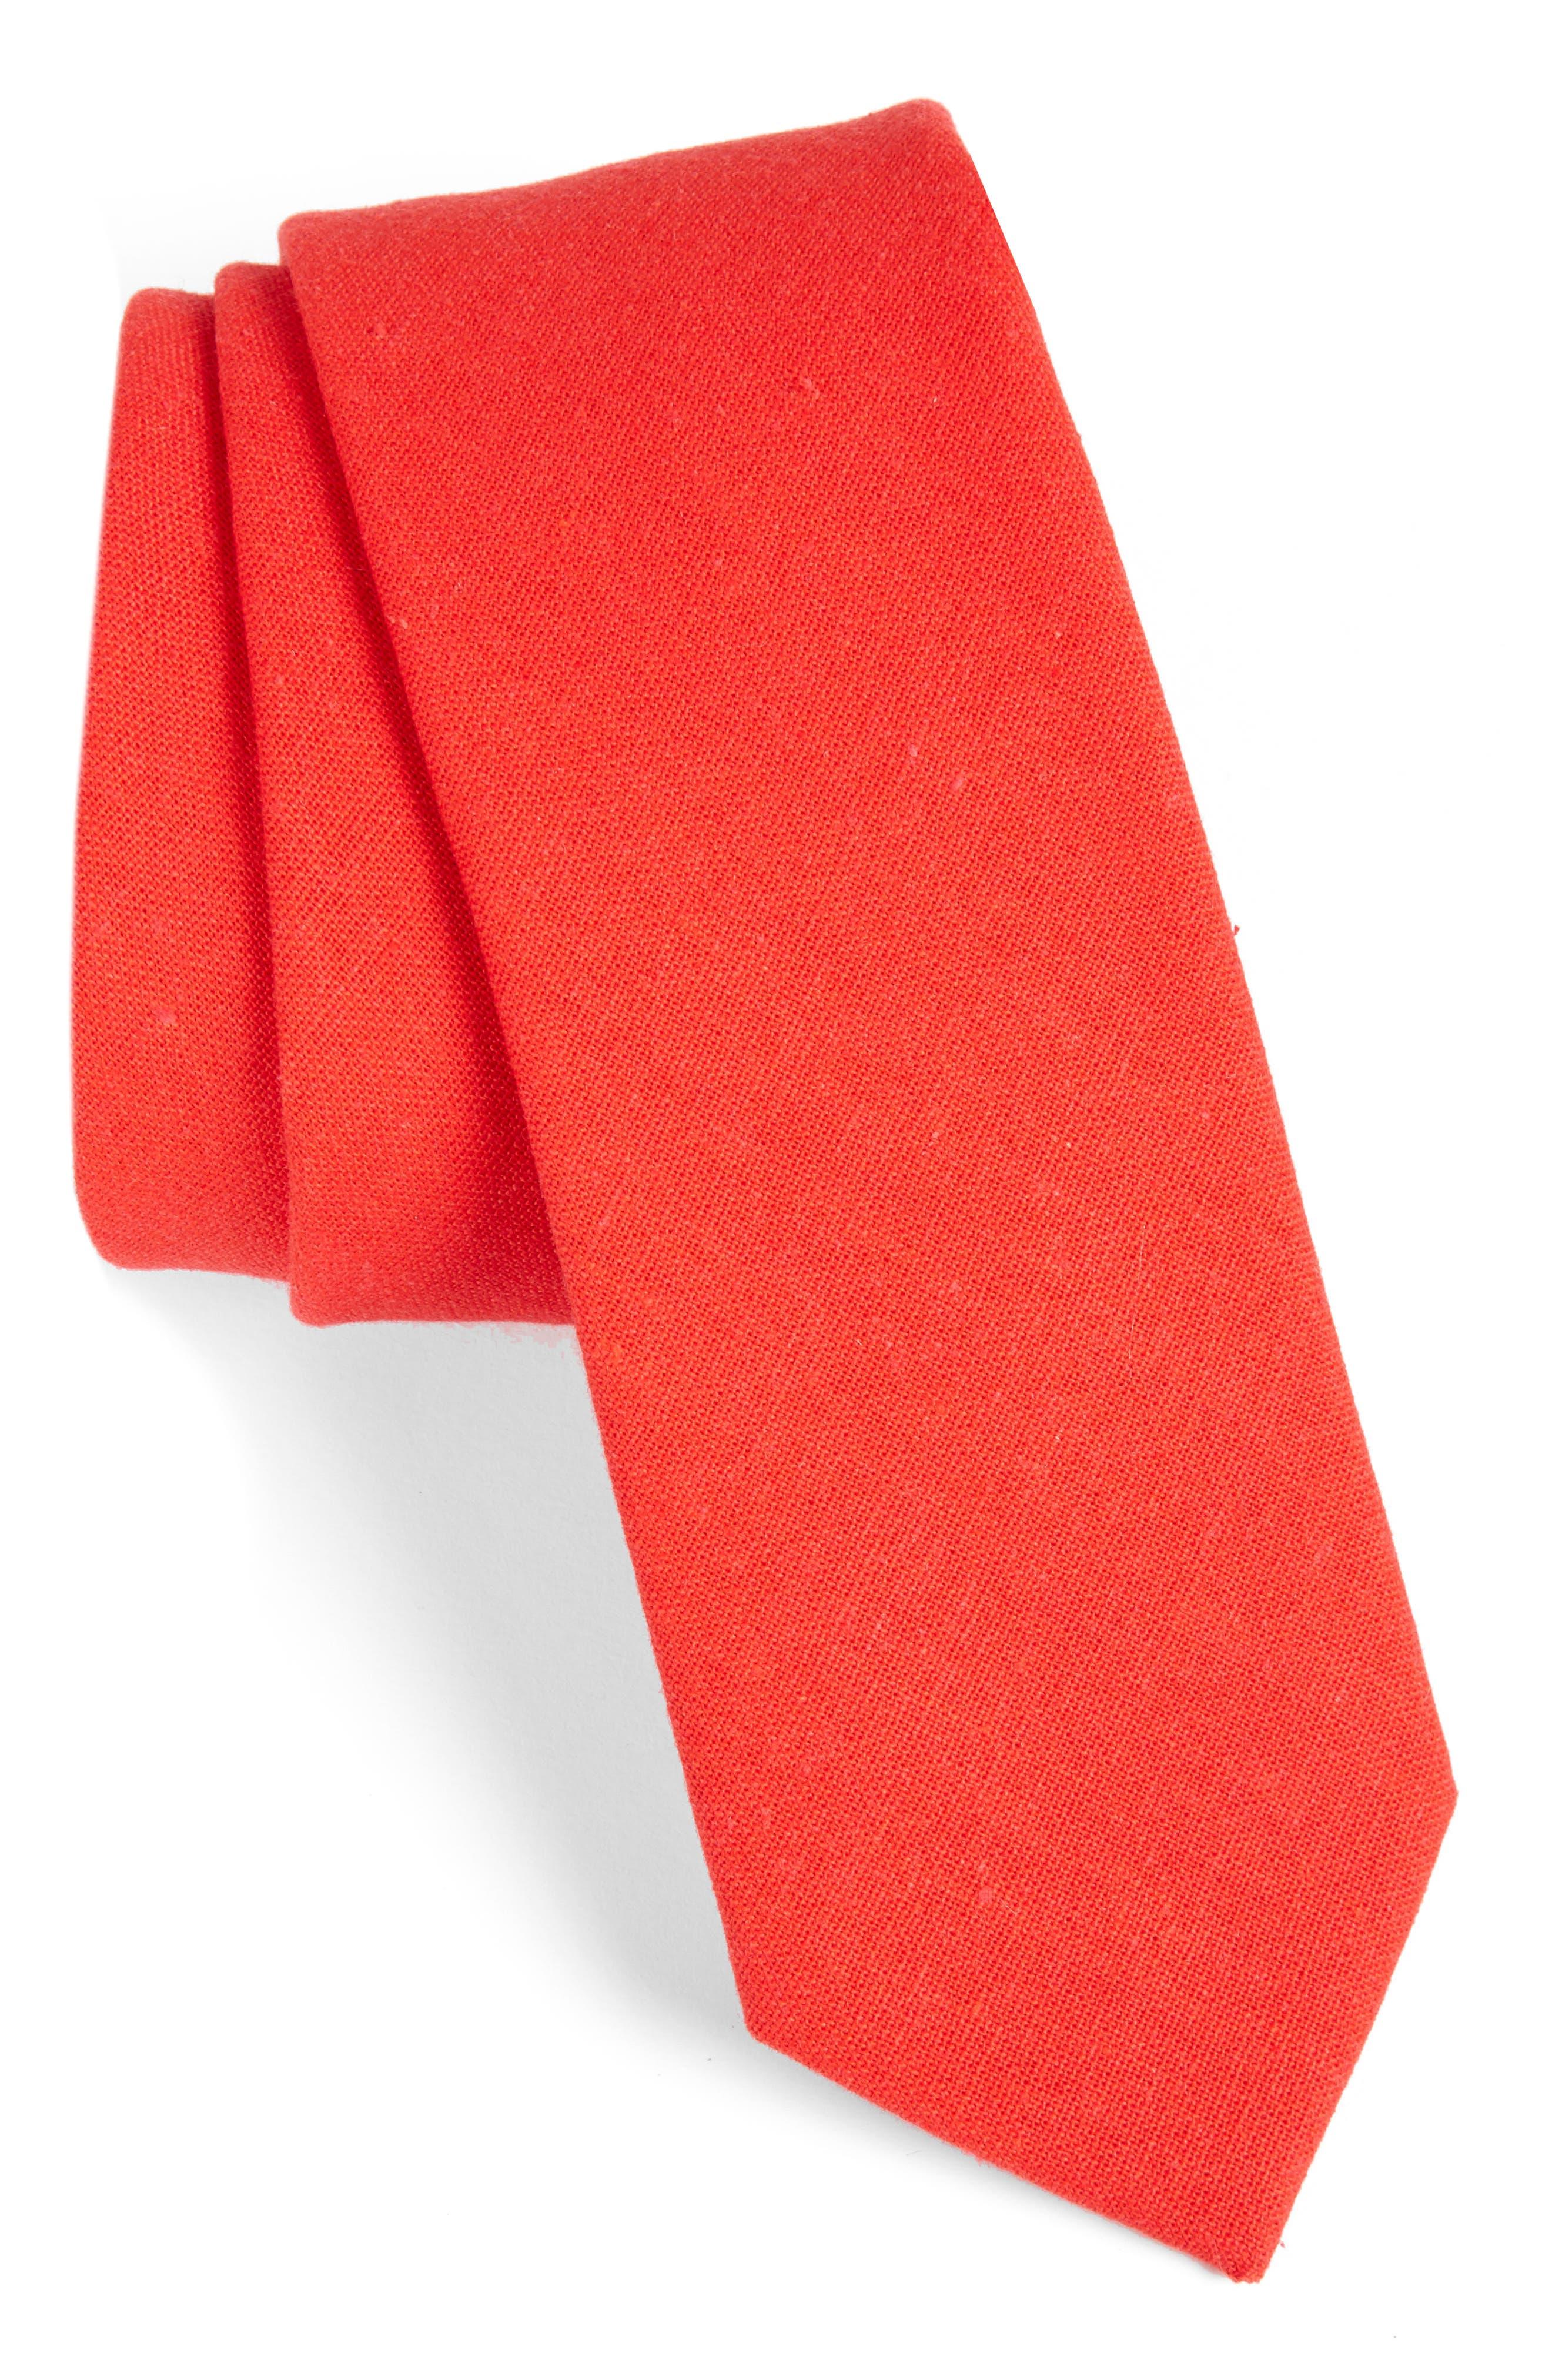 Solid Linen & Cotton Tie,                             Main thumbnail 1, color,                             RED